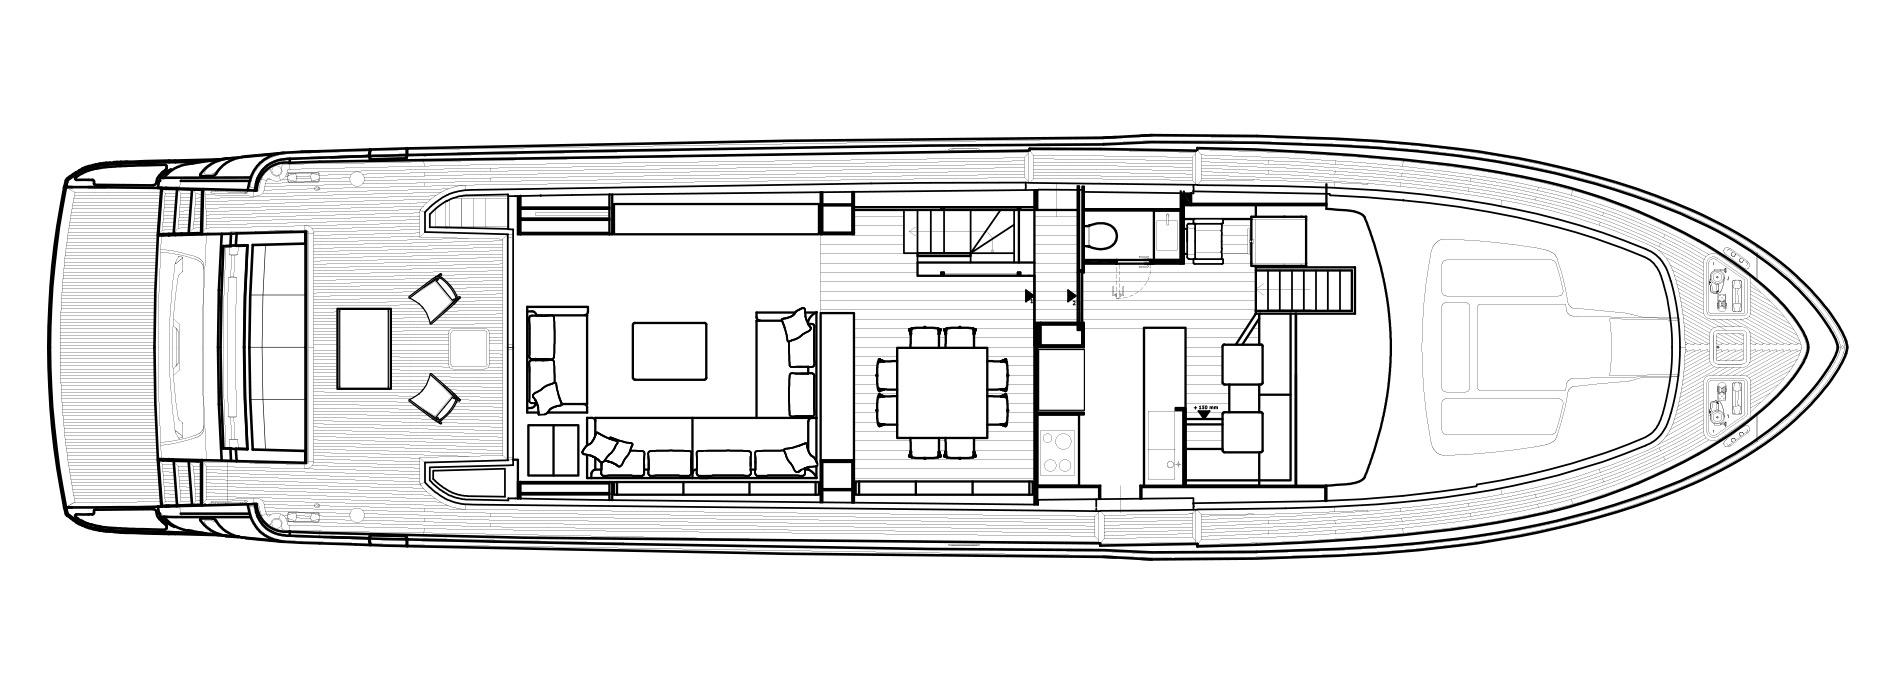 Sanlorenzo Yachts SL86 Main Deck Version USA